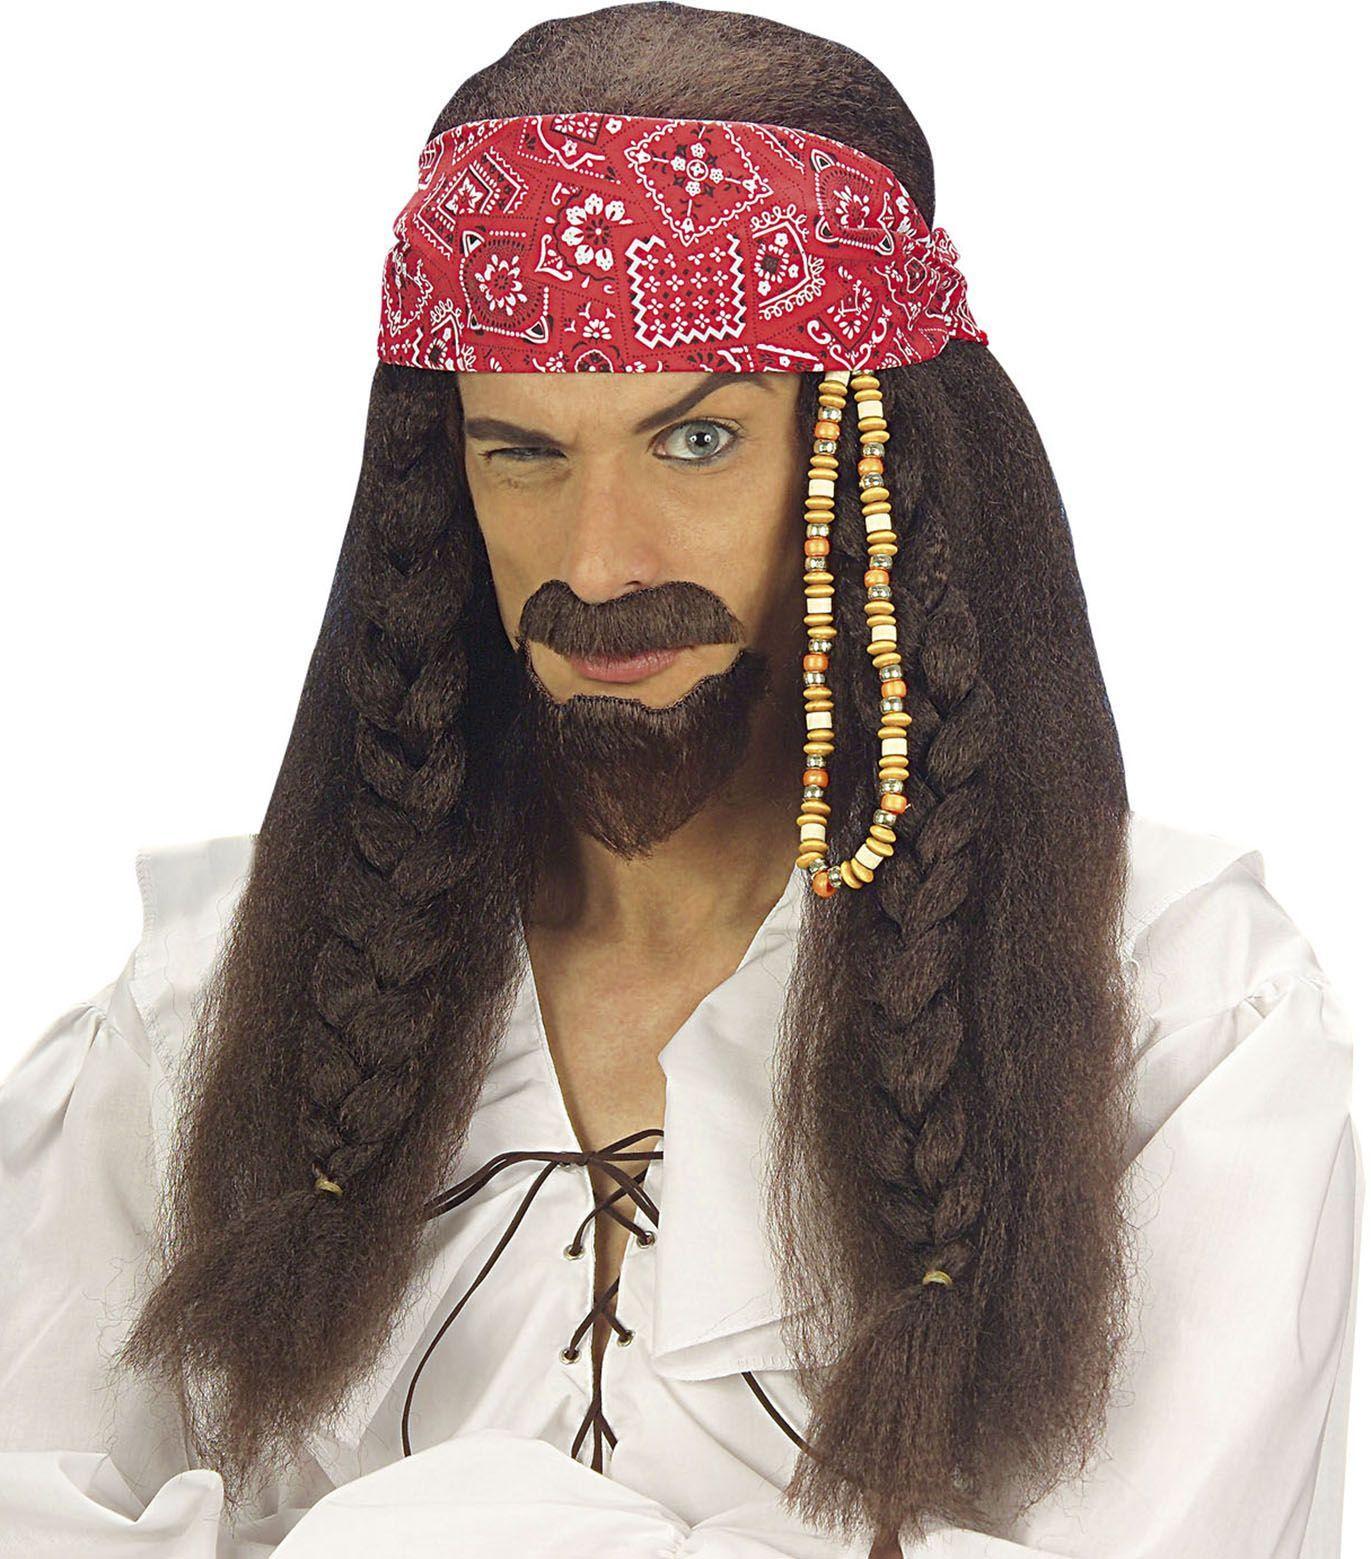 Bruine piraten pruik